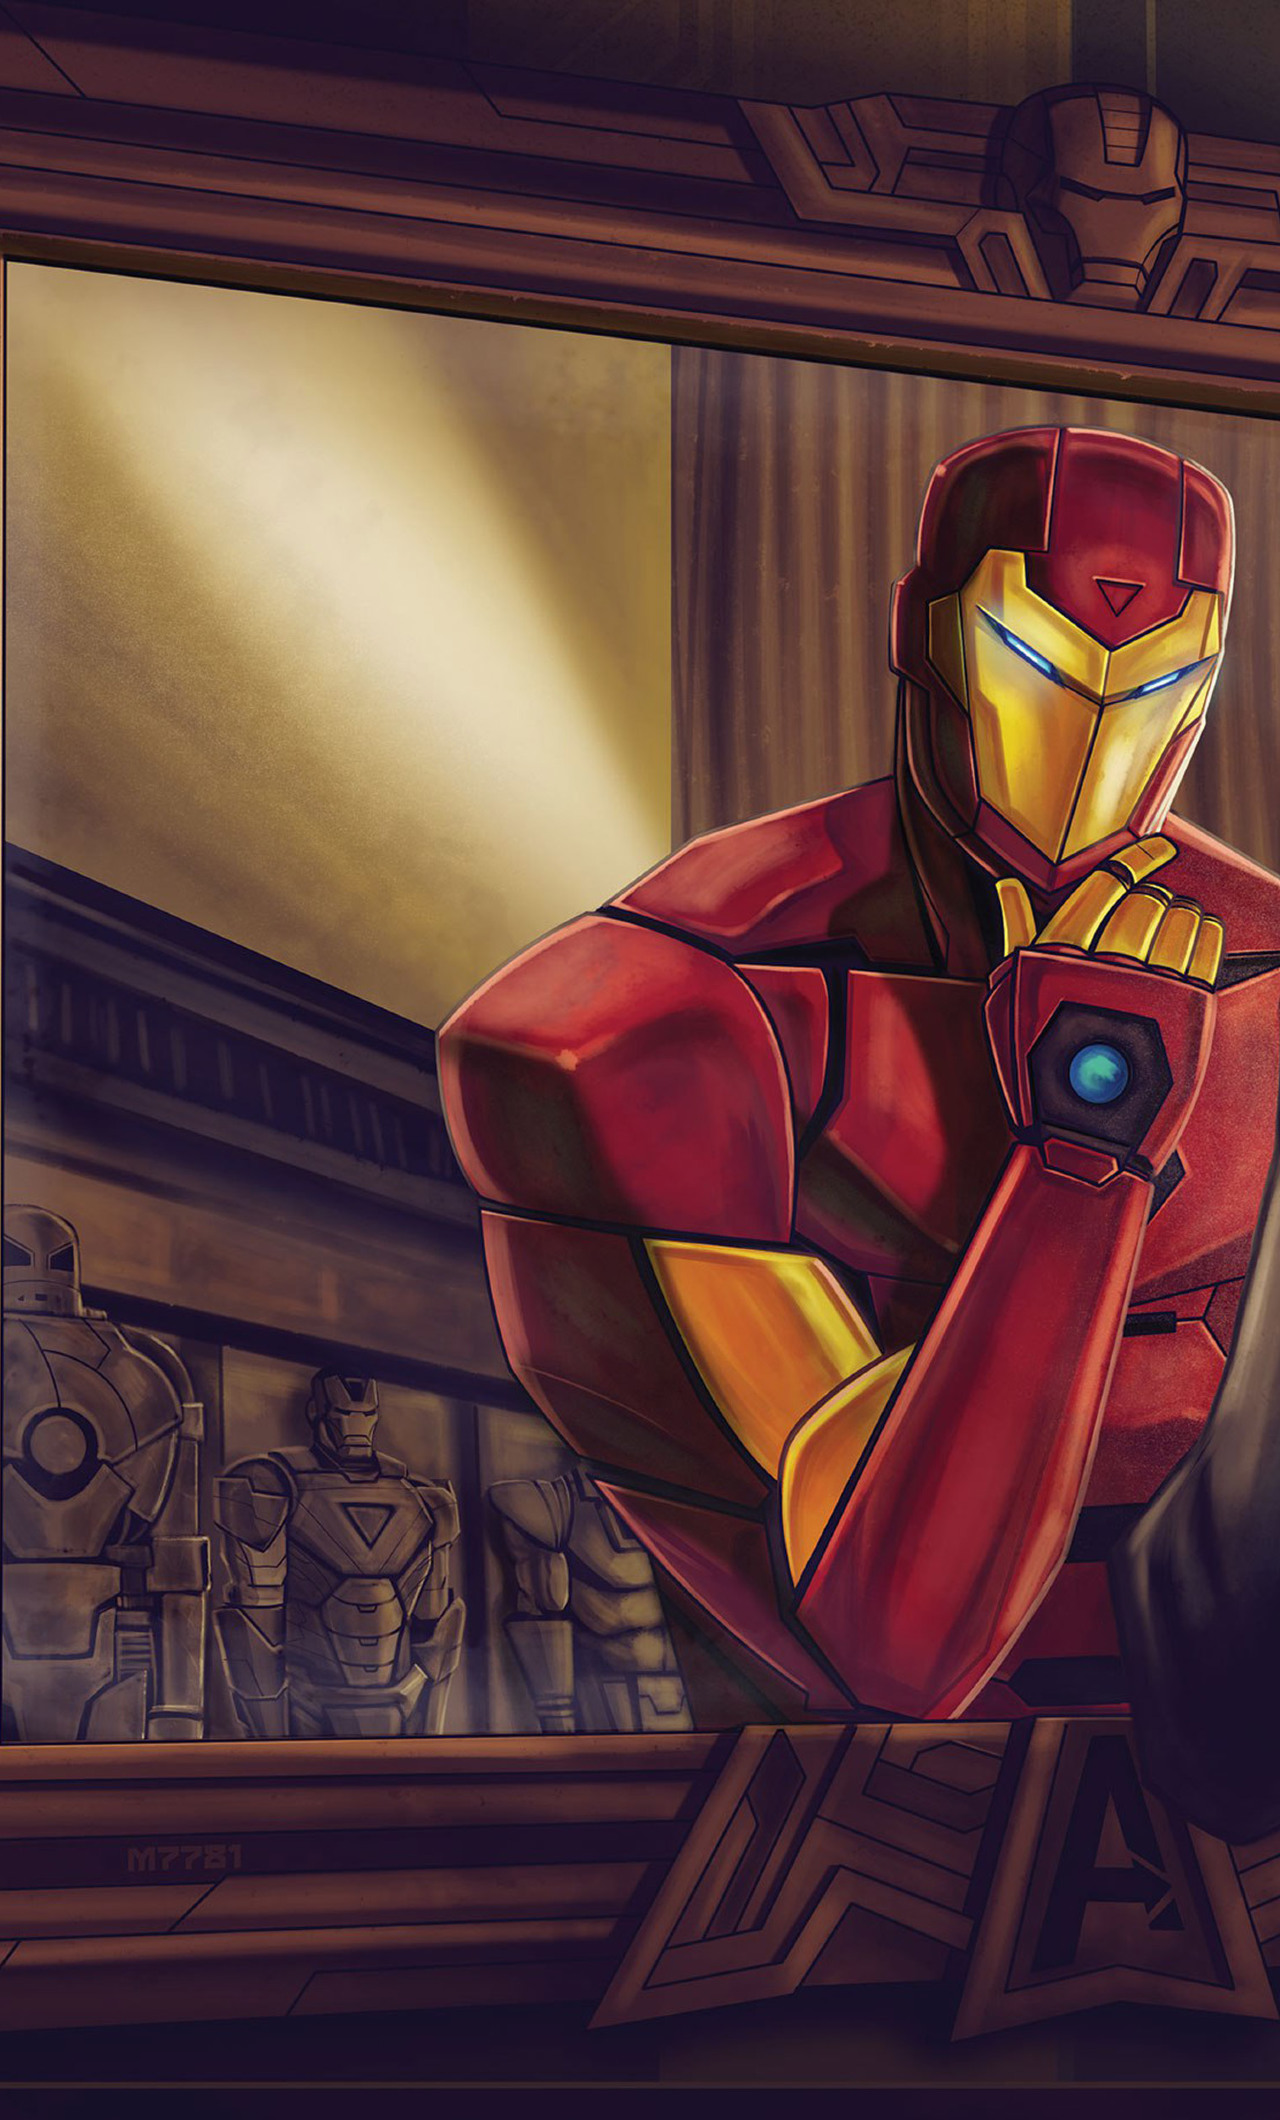 Download International Iron Man 320x480 Resolution, HD 4K